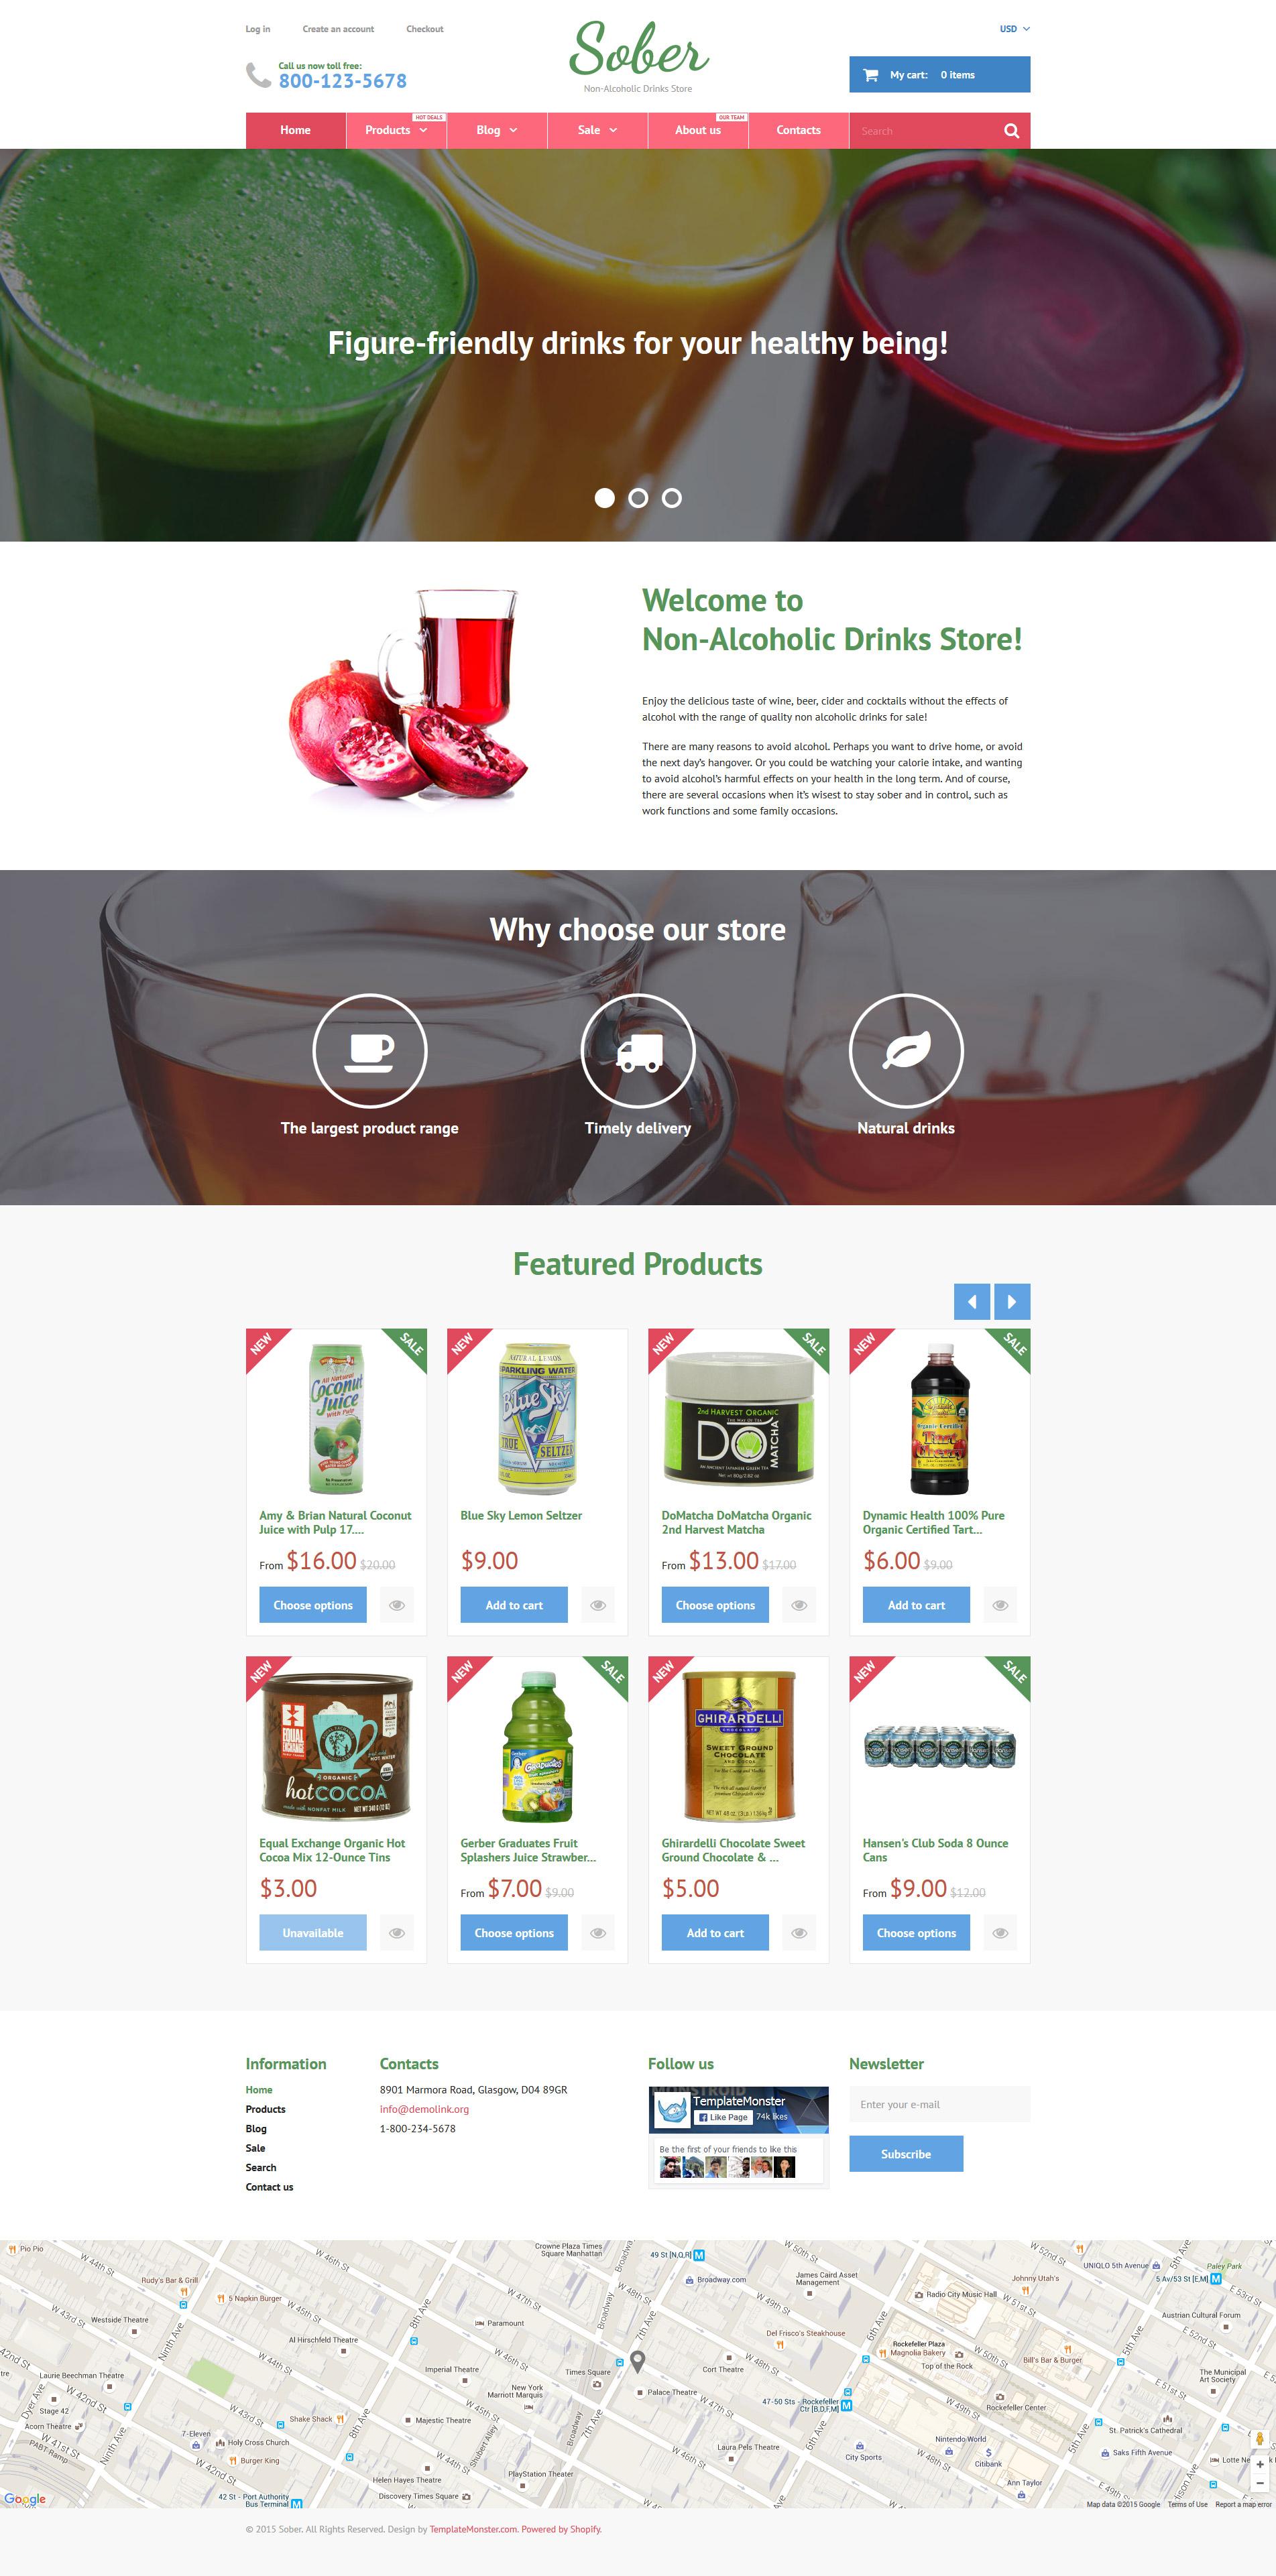 Responsywny szablon Shopify Sober #55742 - zrzut ekranu